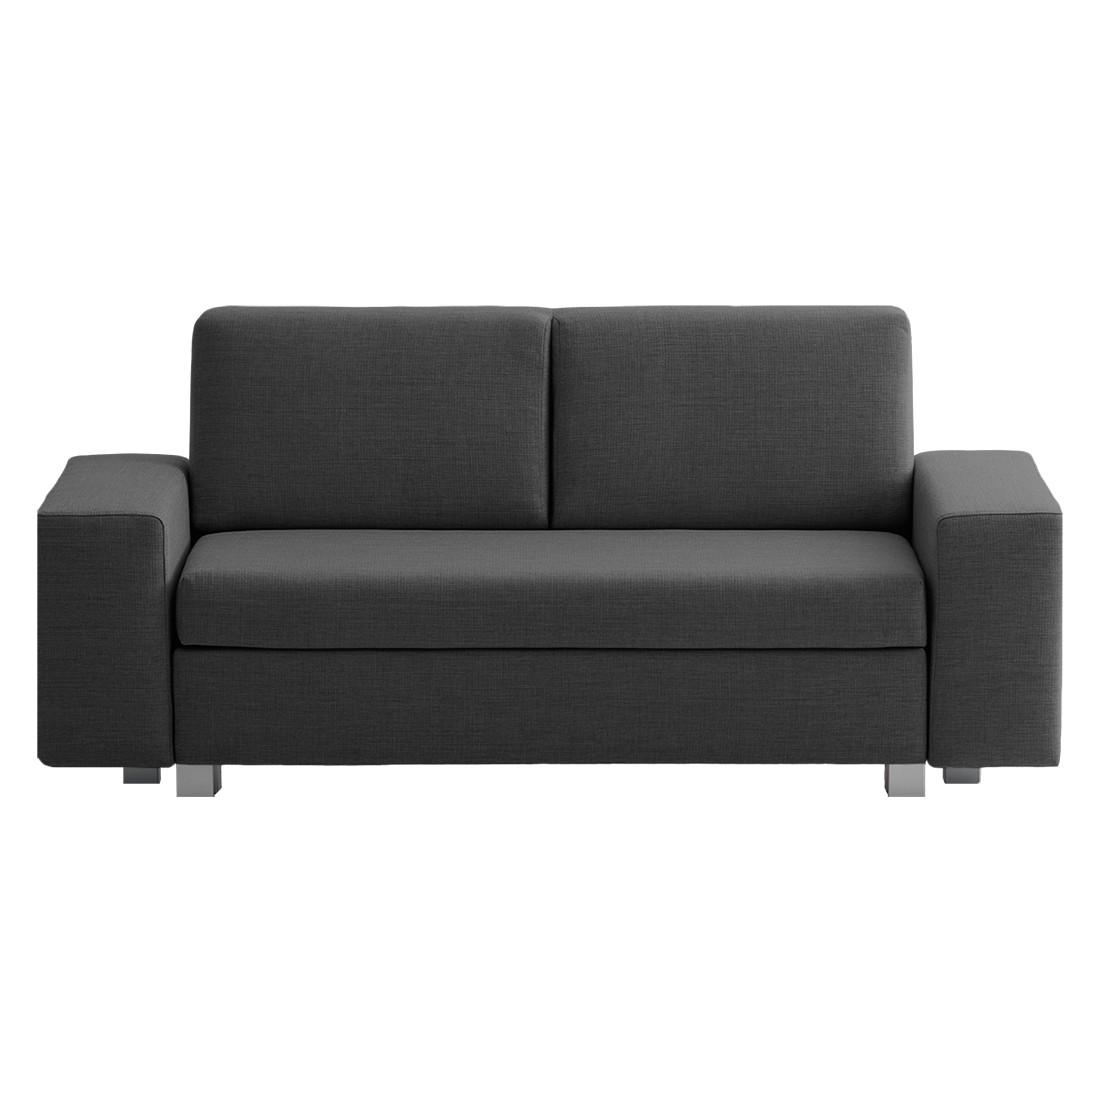 schlafsofa plaza webstoff anthrazit 19 ma e breite 198 cm h he 78 cm. Black Bedroom Furniture Sets. Home Design Ideas